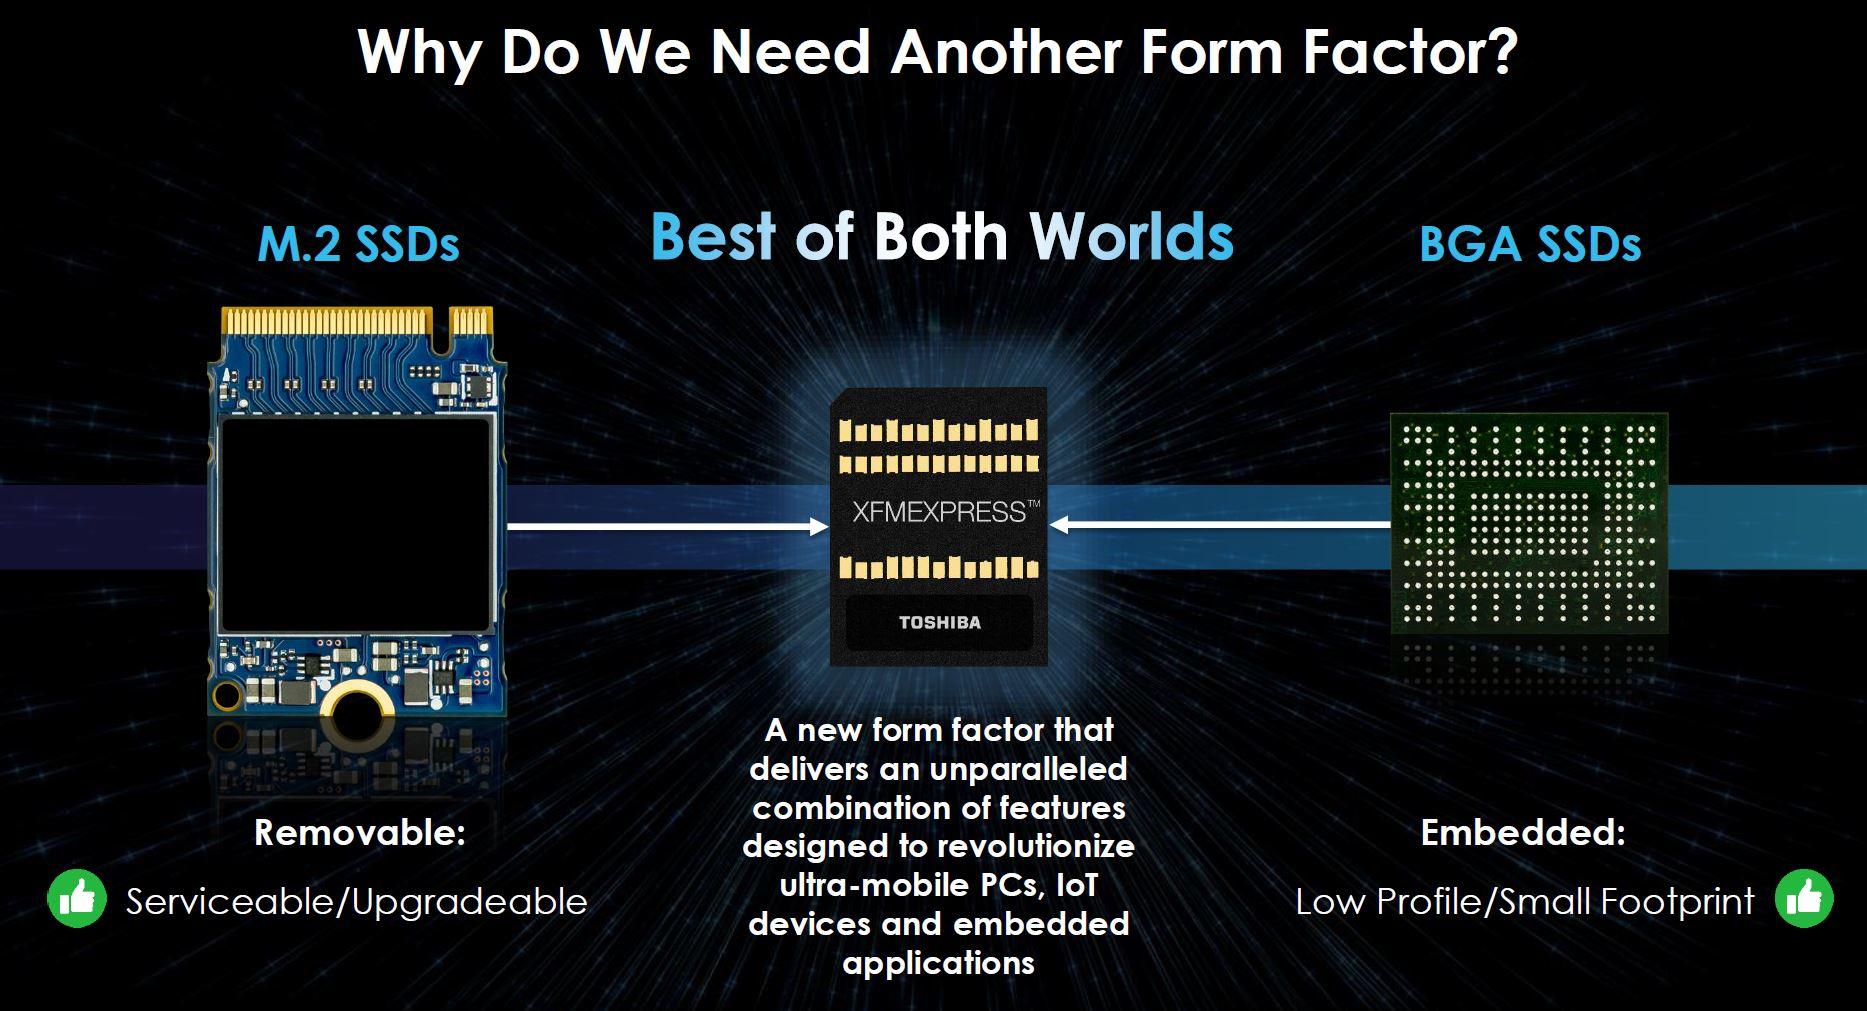 Toshiba XFMEXPRESS V BG4